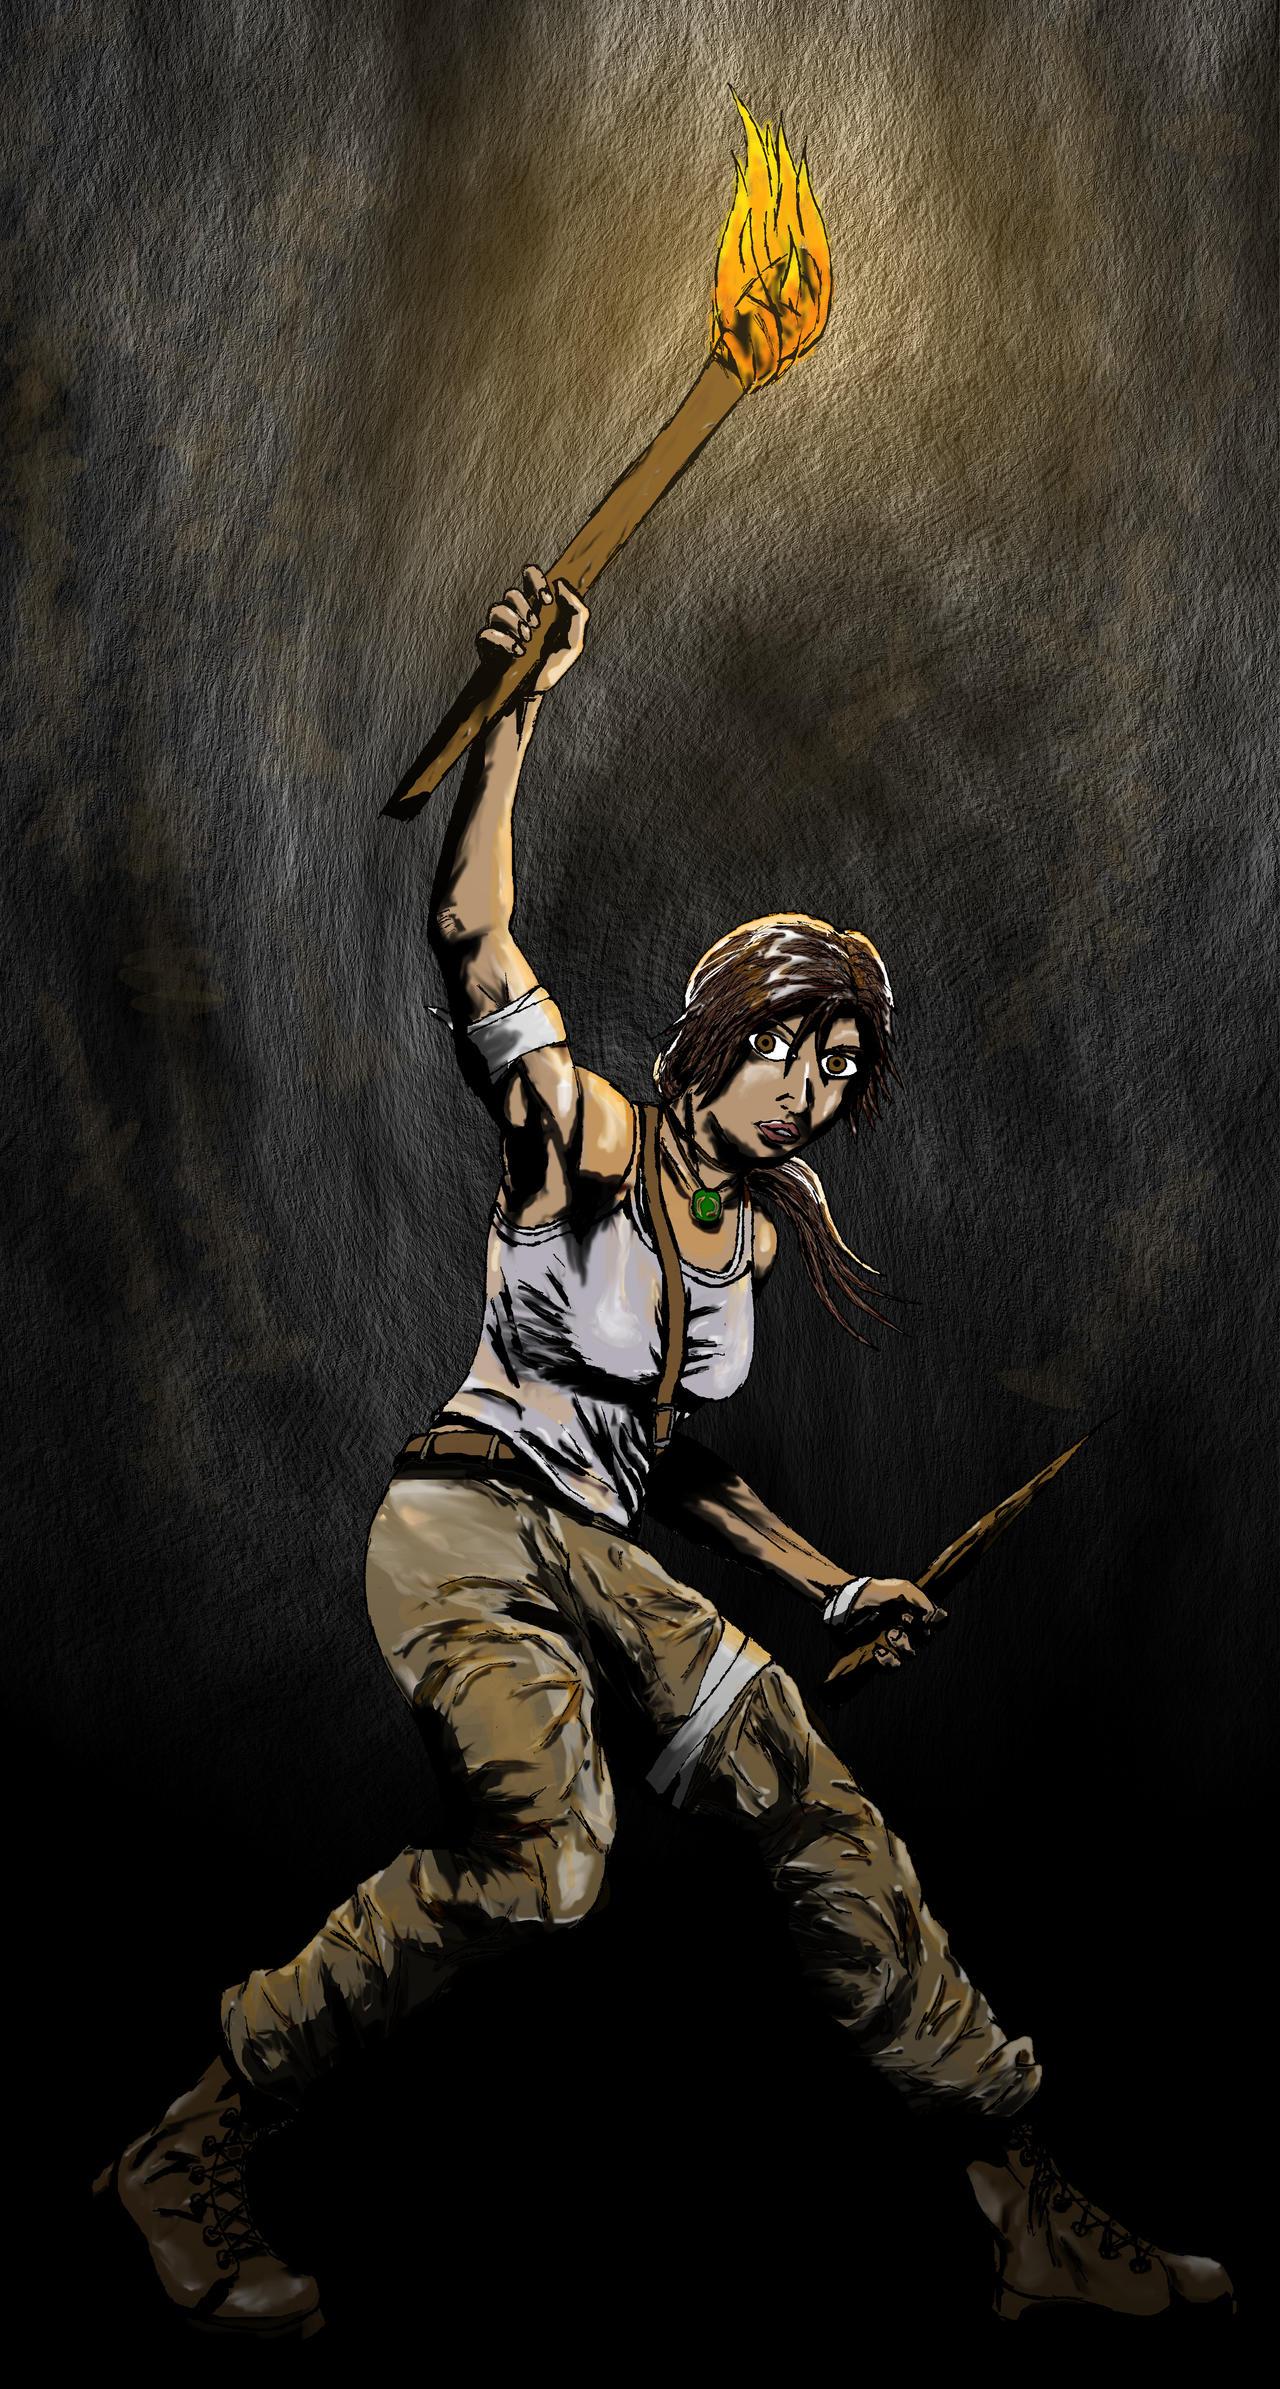 Lara Croft by camriess